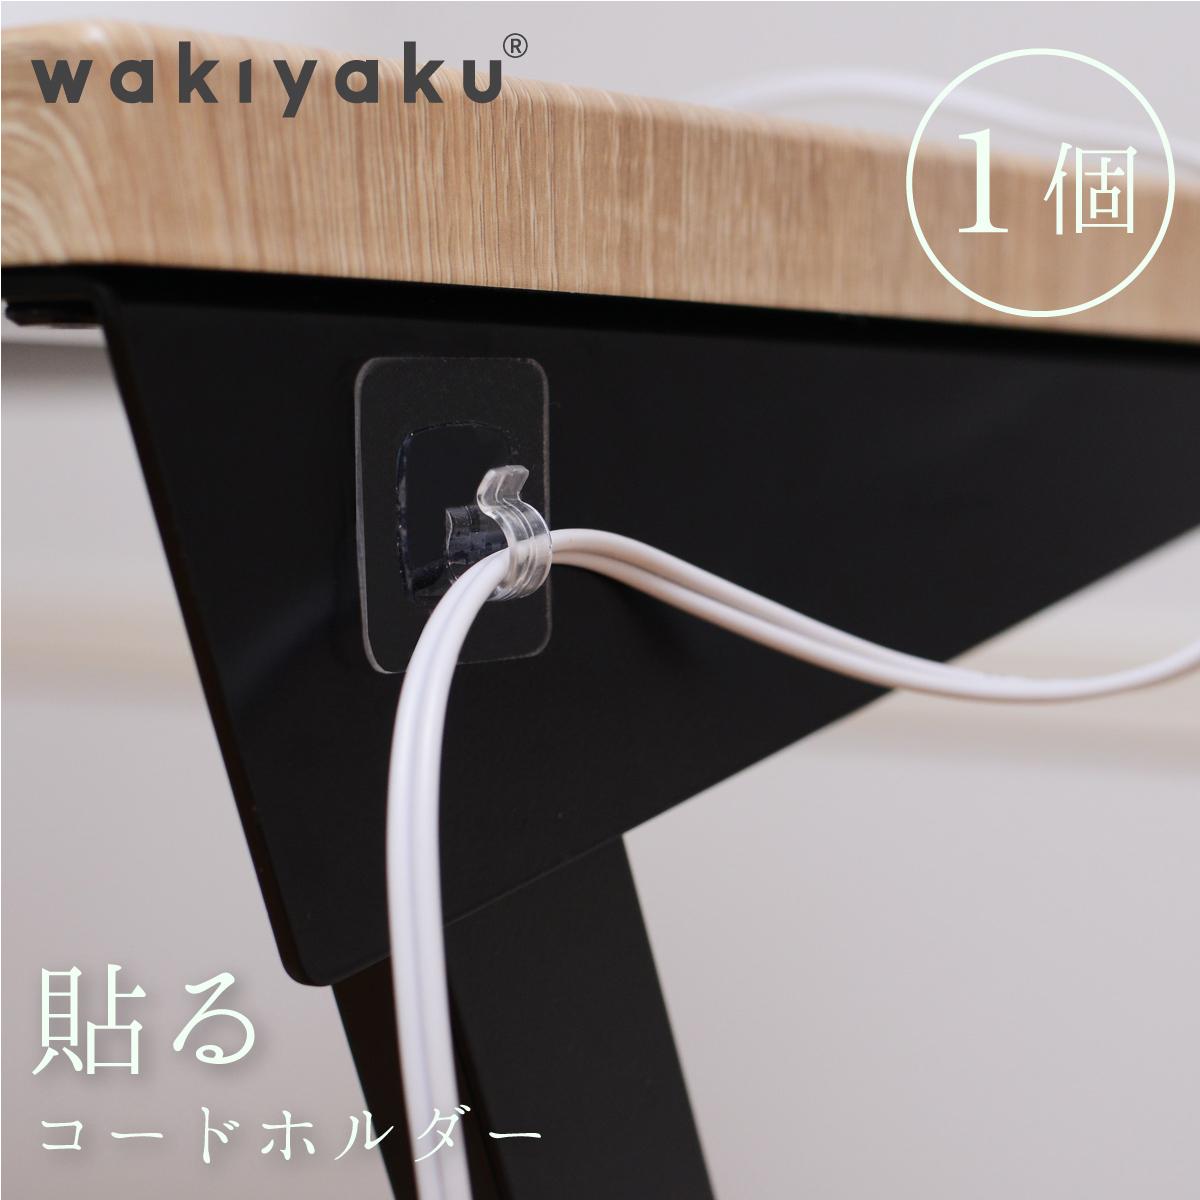 wakiyaku R オンラインショップ ラッピング無料 浮かせる収納 コード ホルダー 貼ってはがせる まとめ ケーブルホルダーコードクリップ 壁掛け ケーブル ケーブルクリップ 収納